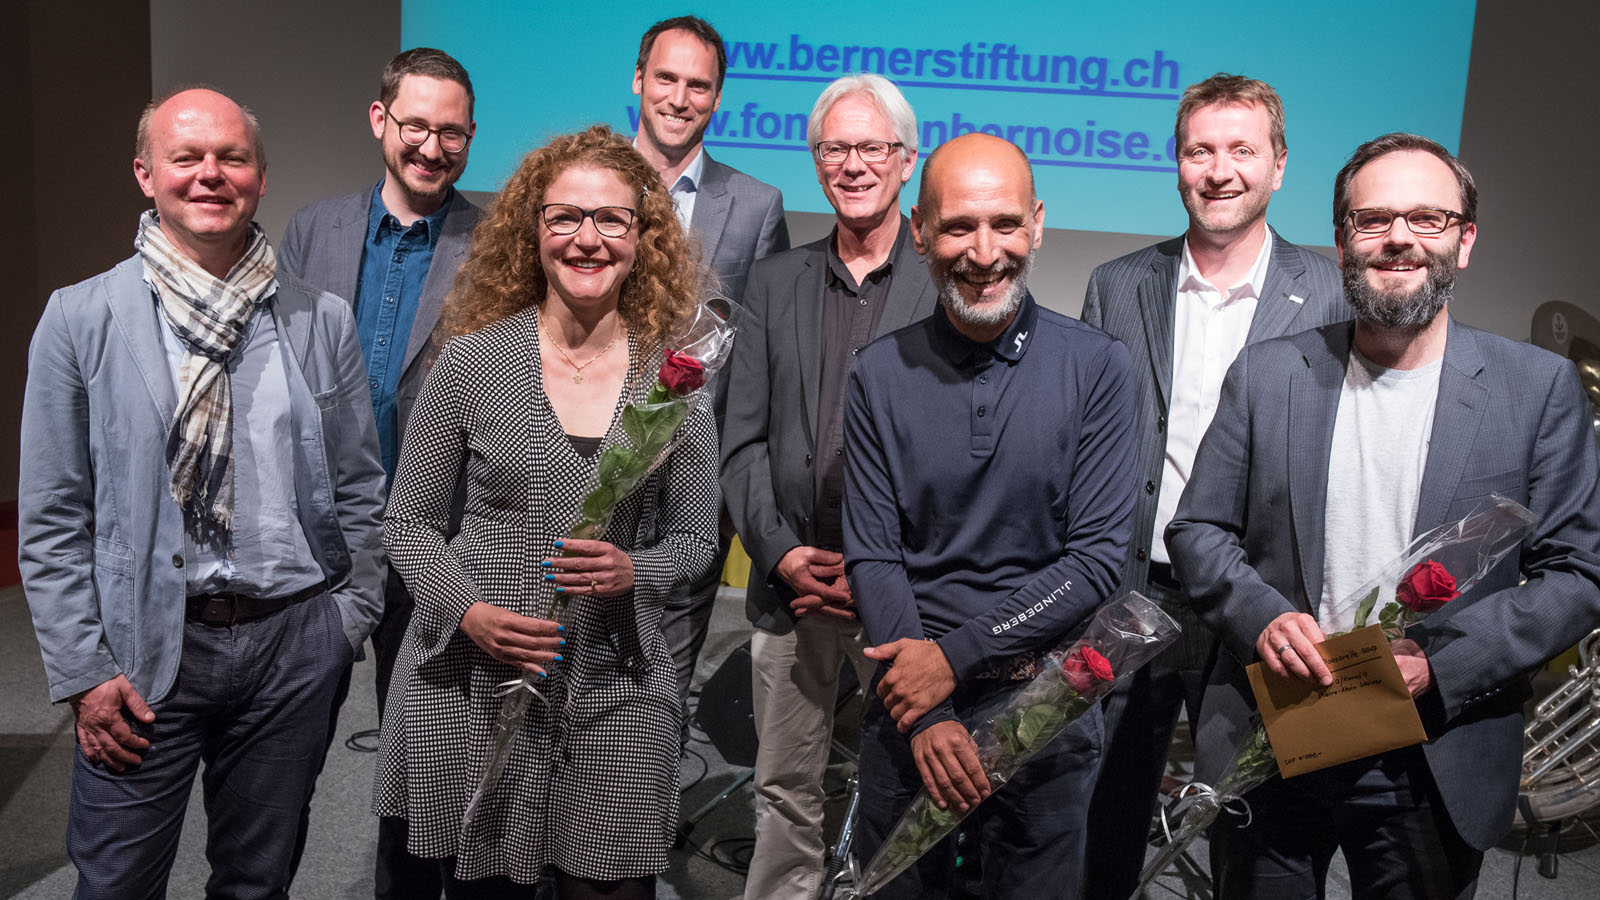 Preisverleihung 2017 | Remise des prix 2017